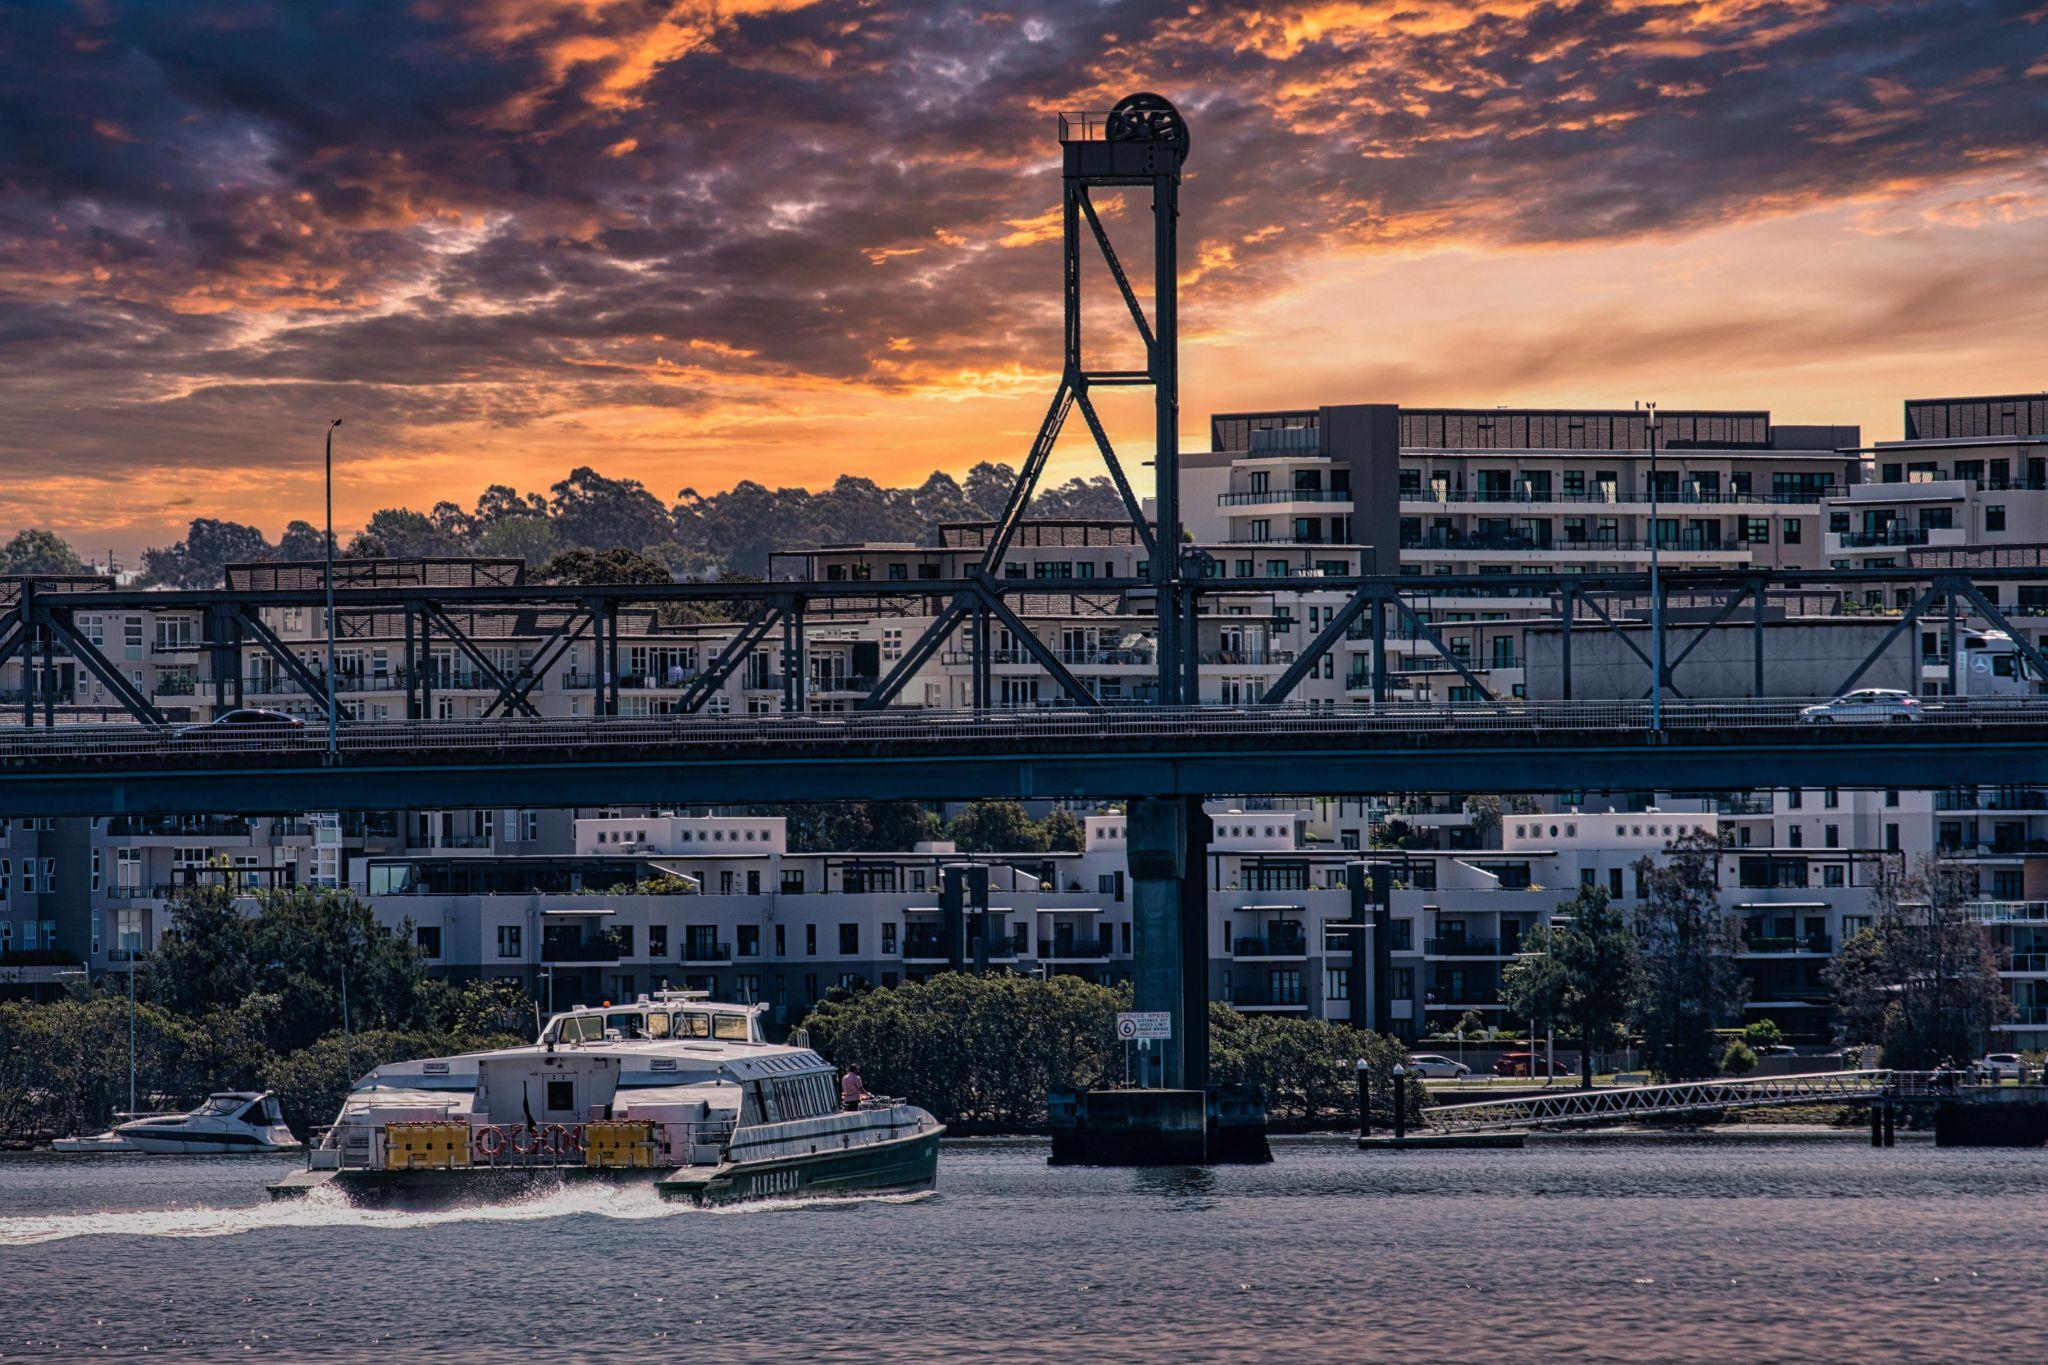 Rivercat Ryde Bridge sunset, Sydney, NSW, Australia